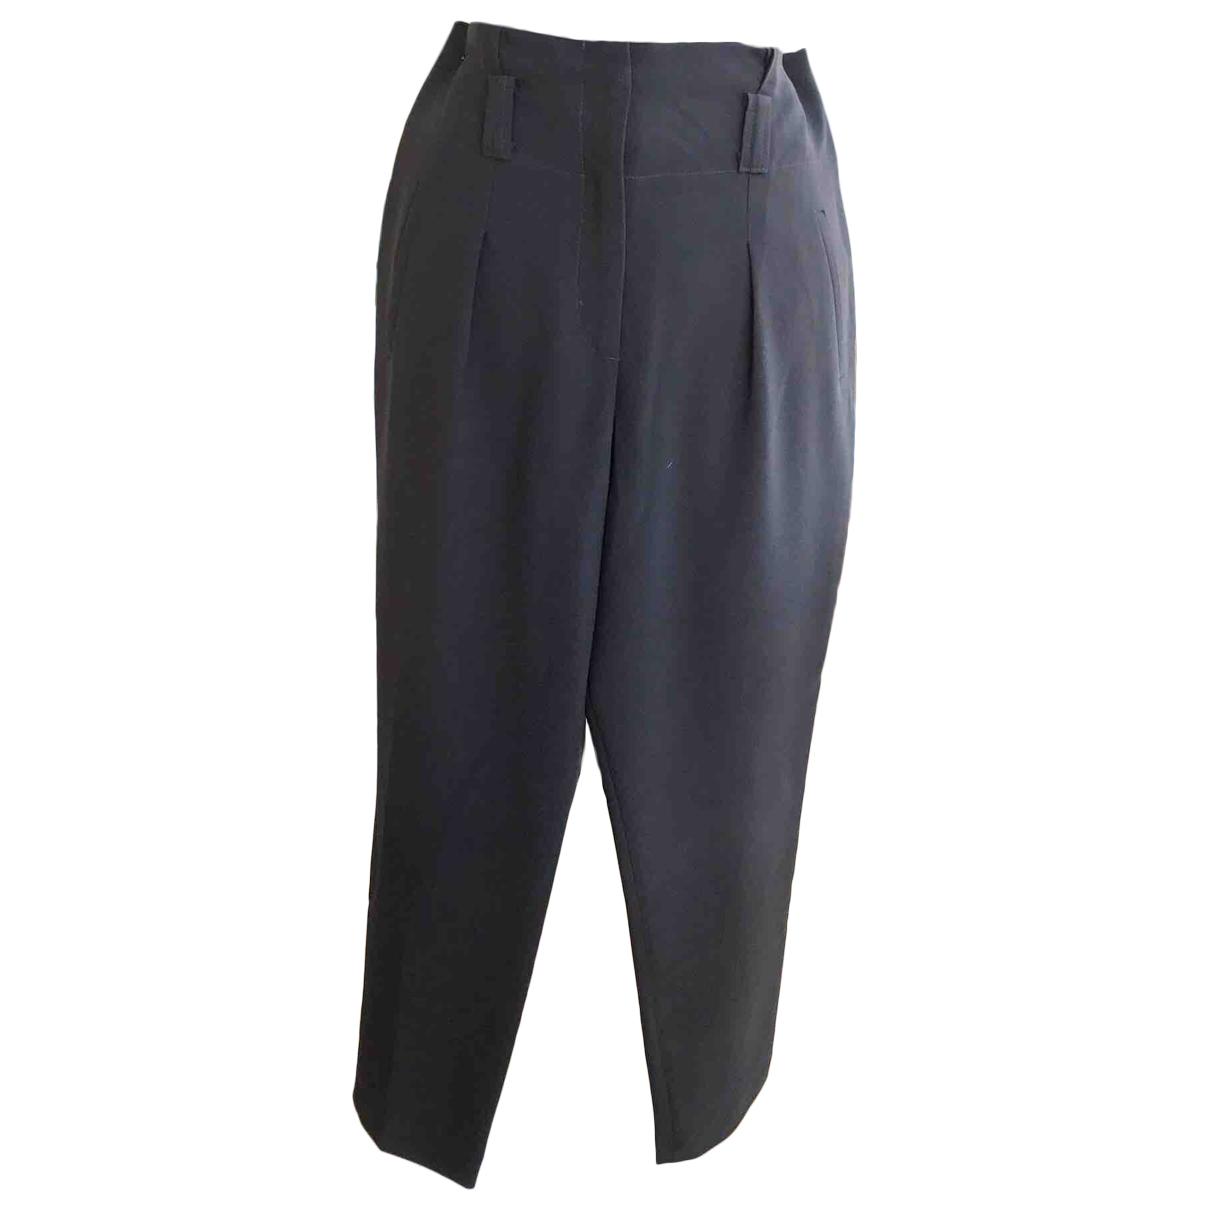 Claudie Pierlot \N Black Trousers for Women 40 FR